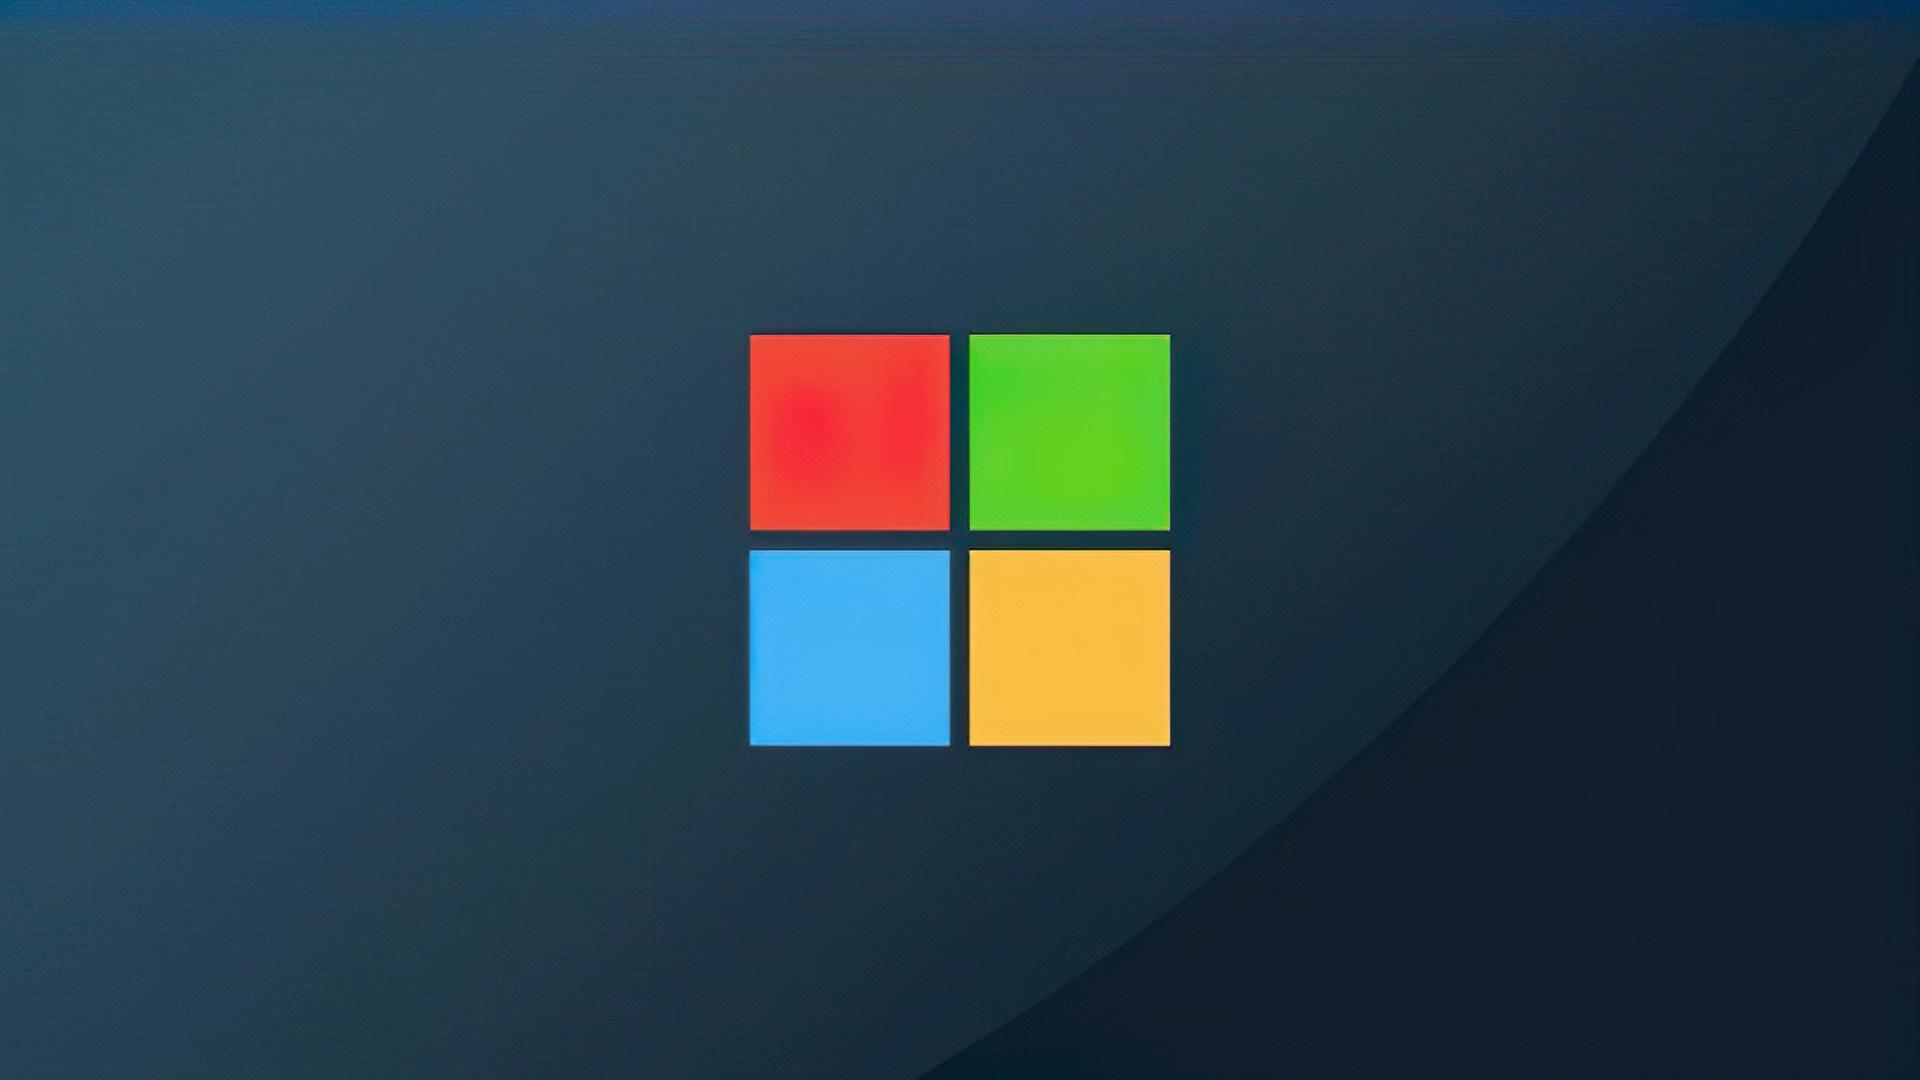 Microsoft, Betriebssystem, Windows 10, Windows, Logo, Windows Logo, Windows 10 Logo